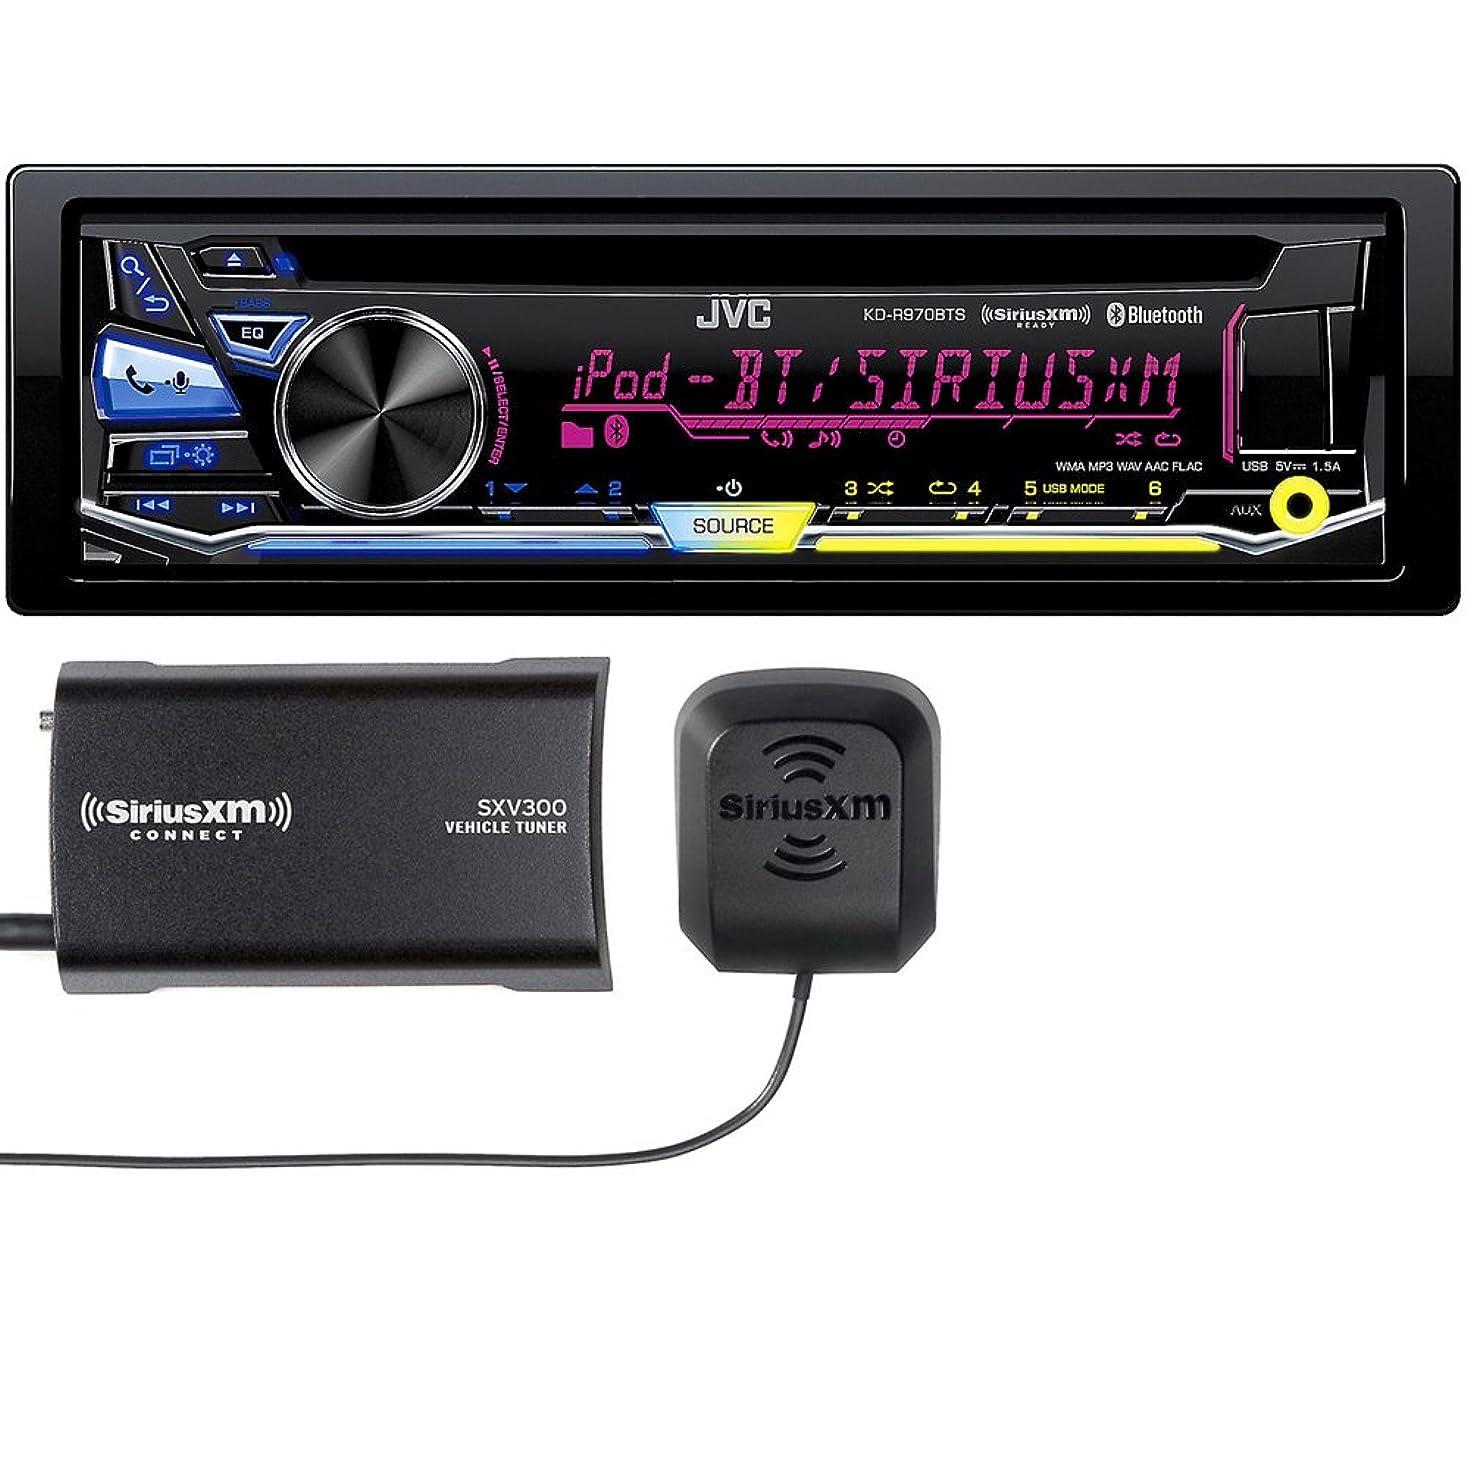 JVC KD-R970BTS CD with SXV300 Sirius XM Tuner